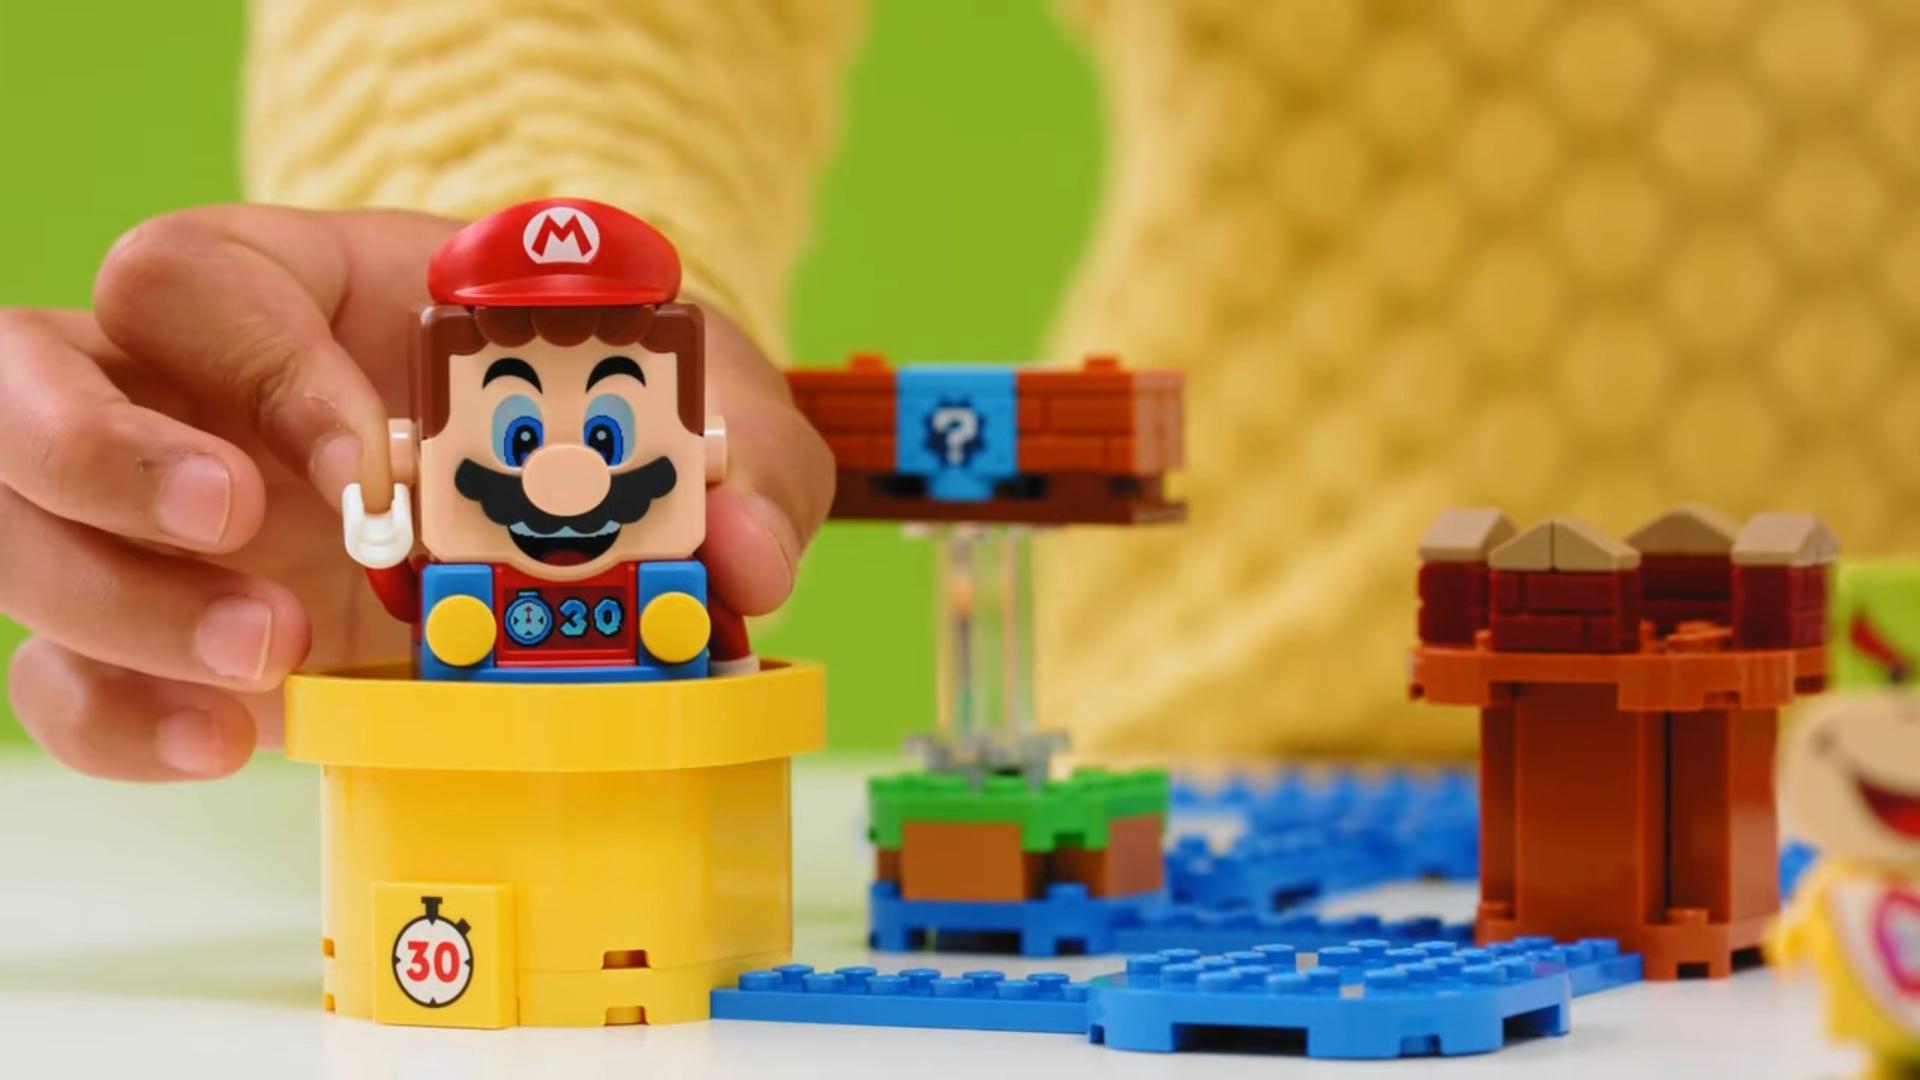 Nya Lego Super Mario-set utannonserade